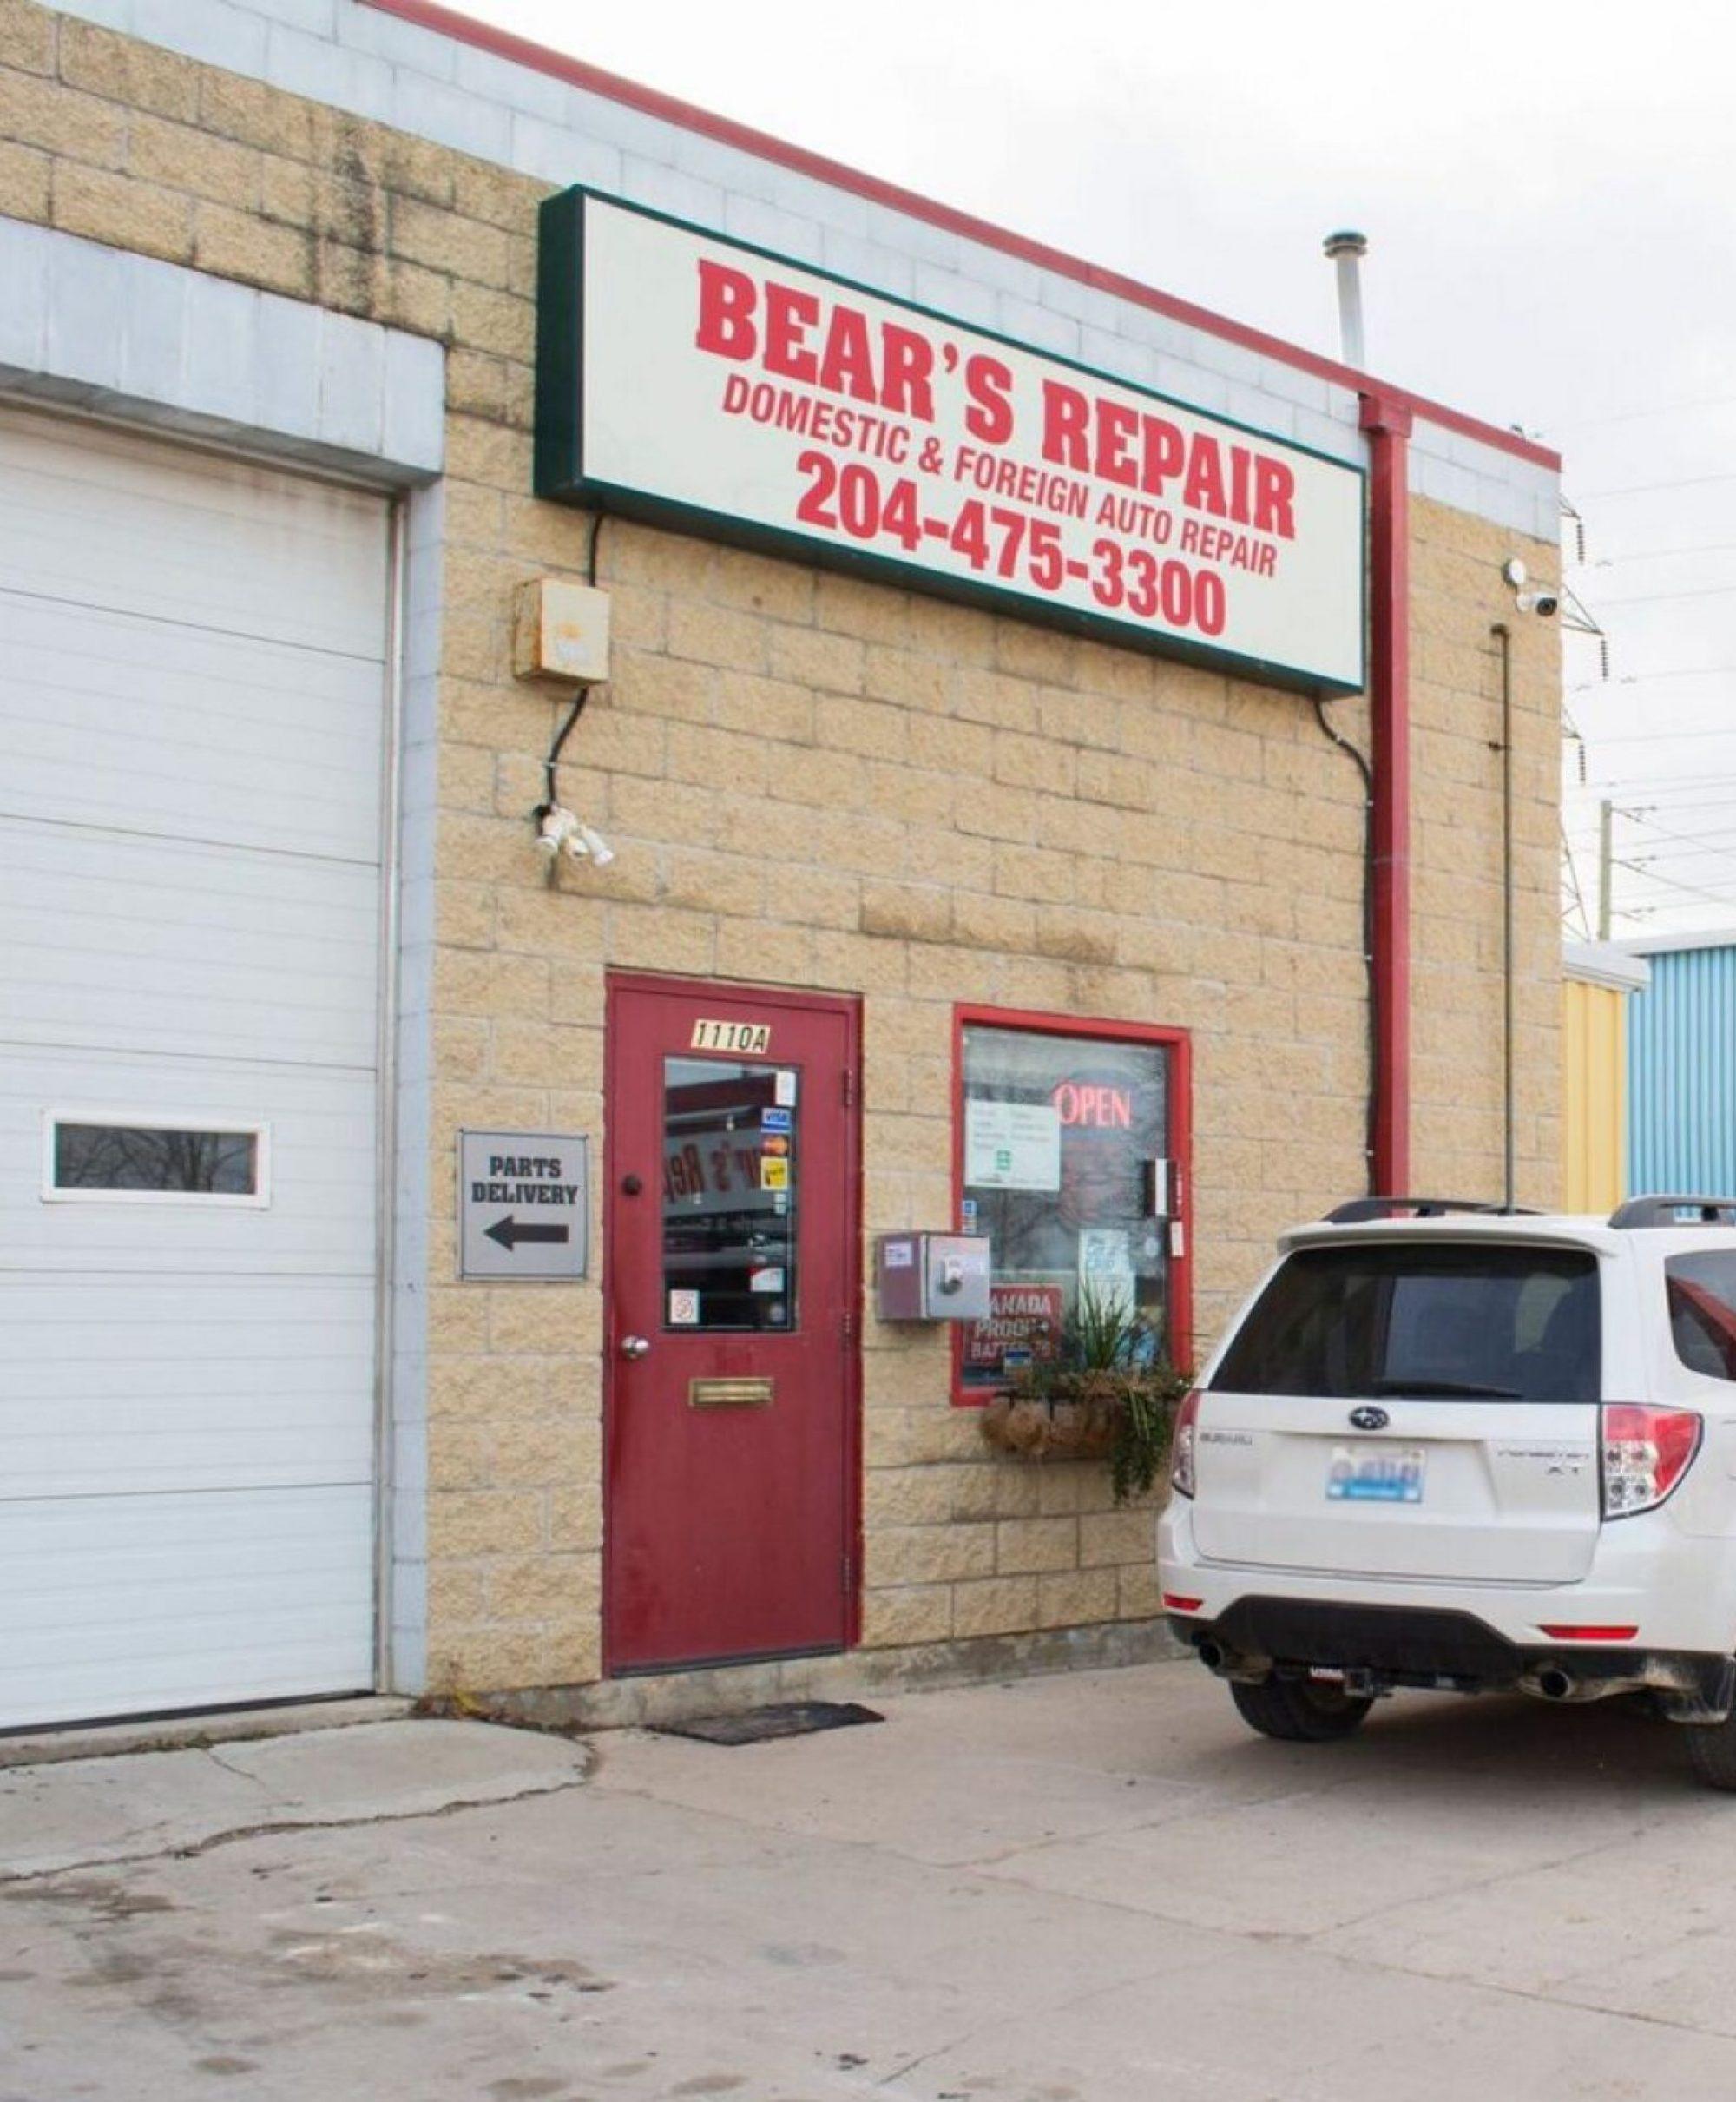 Bear's Repair Auto Service